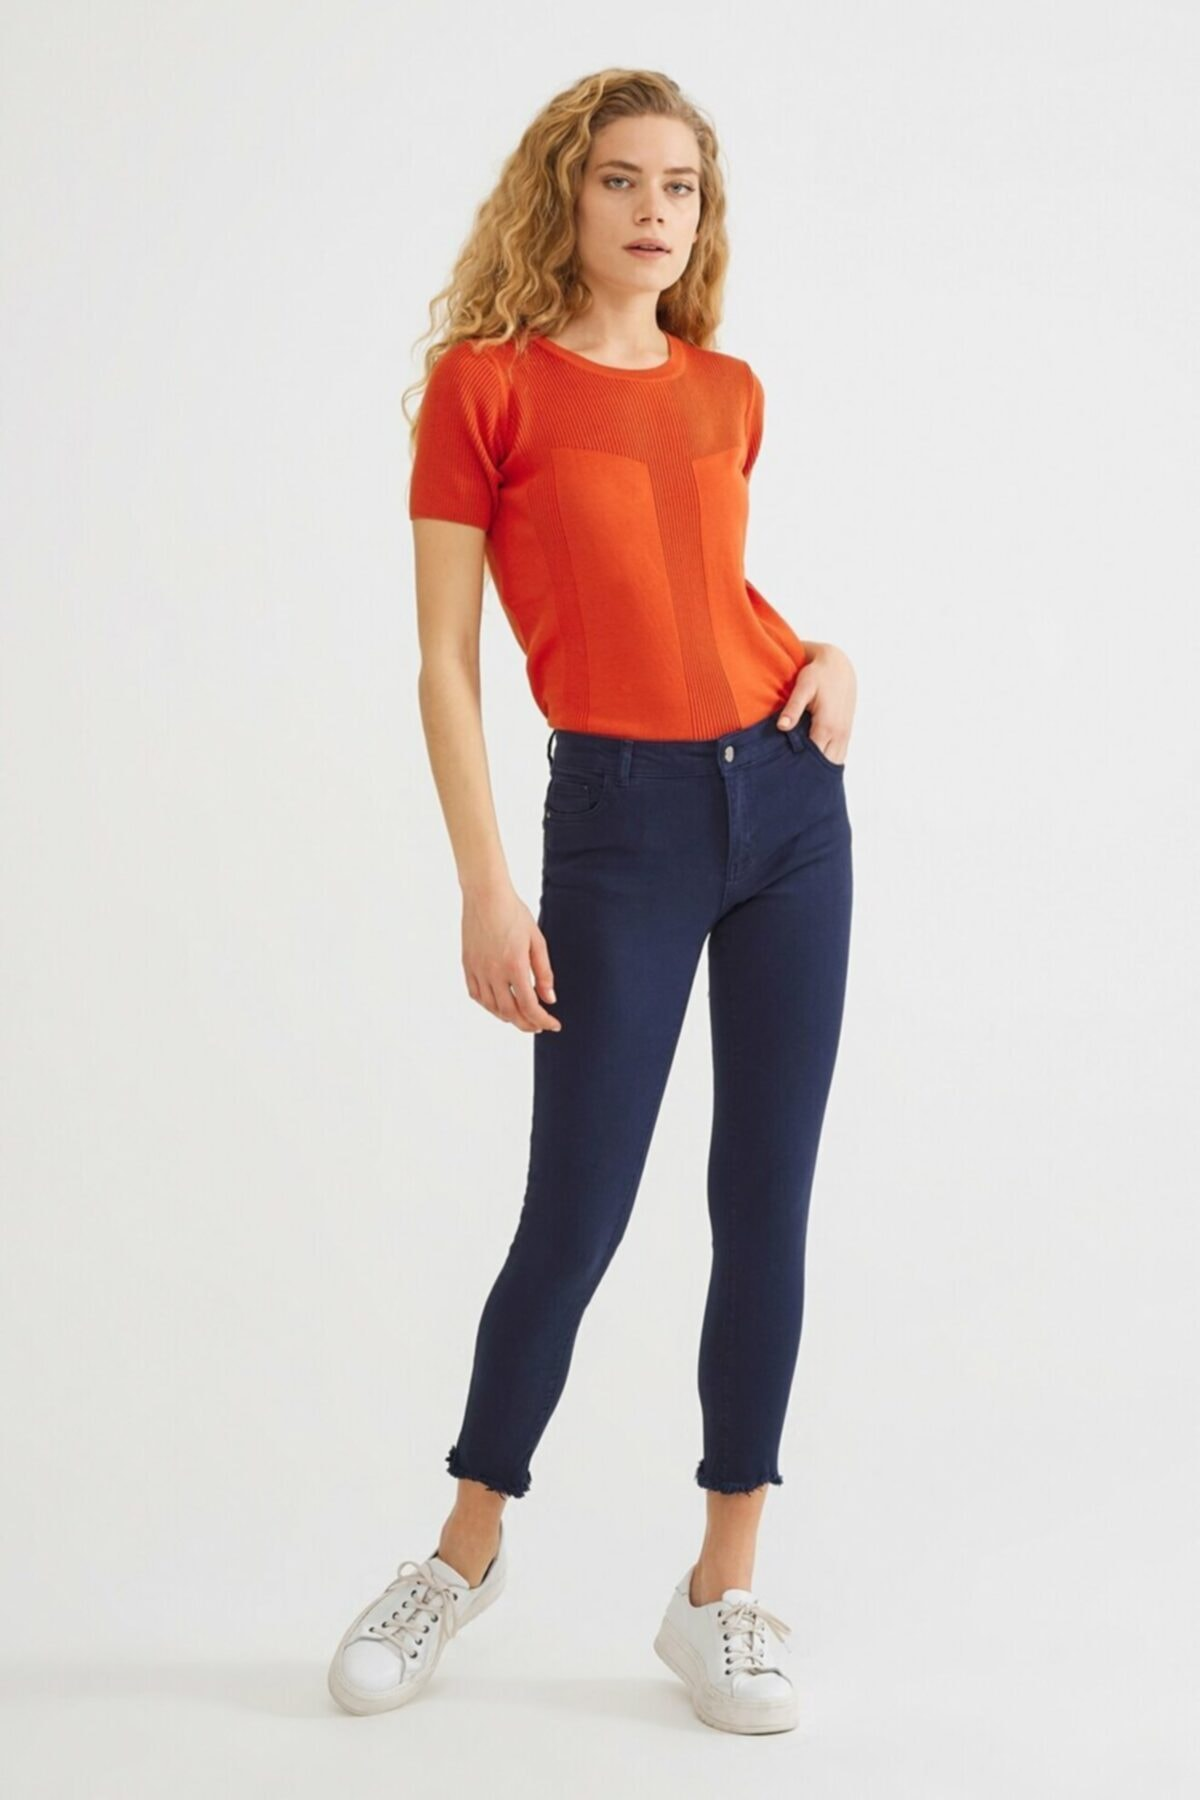 adL Kadın Lacivert Paça Detaylı Pantolon 15336759001018 1